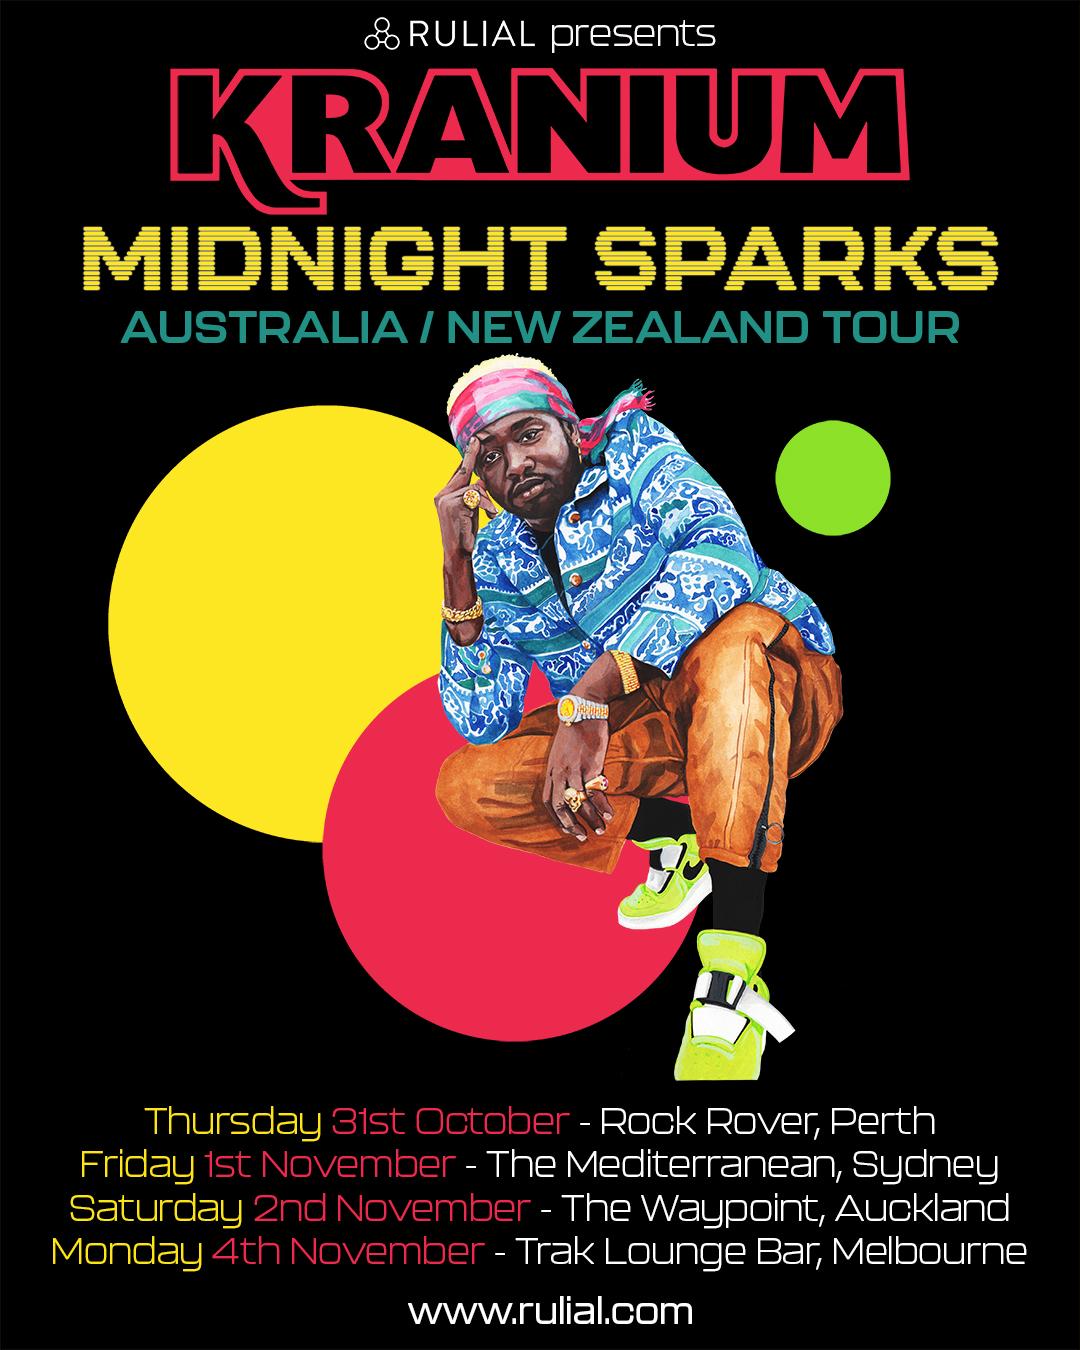 KRANIUM AUSTRALIA & NEW ZEALAND TOUR